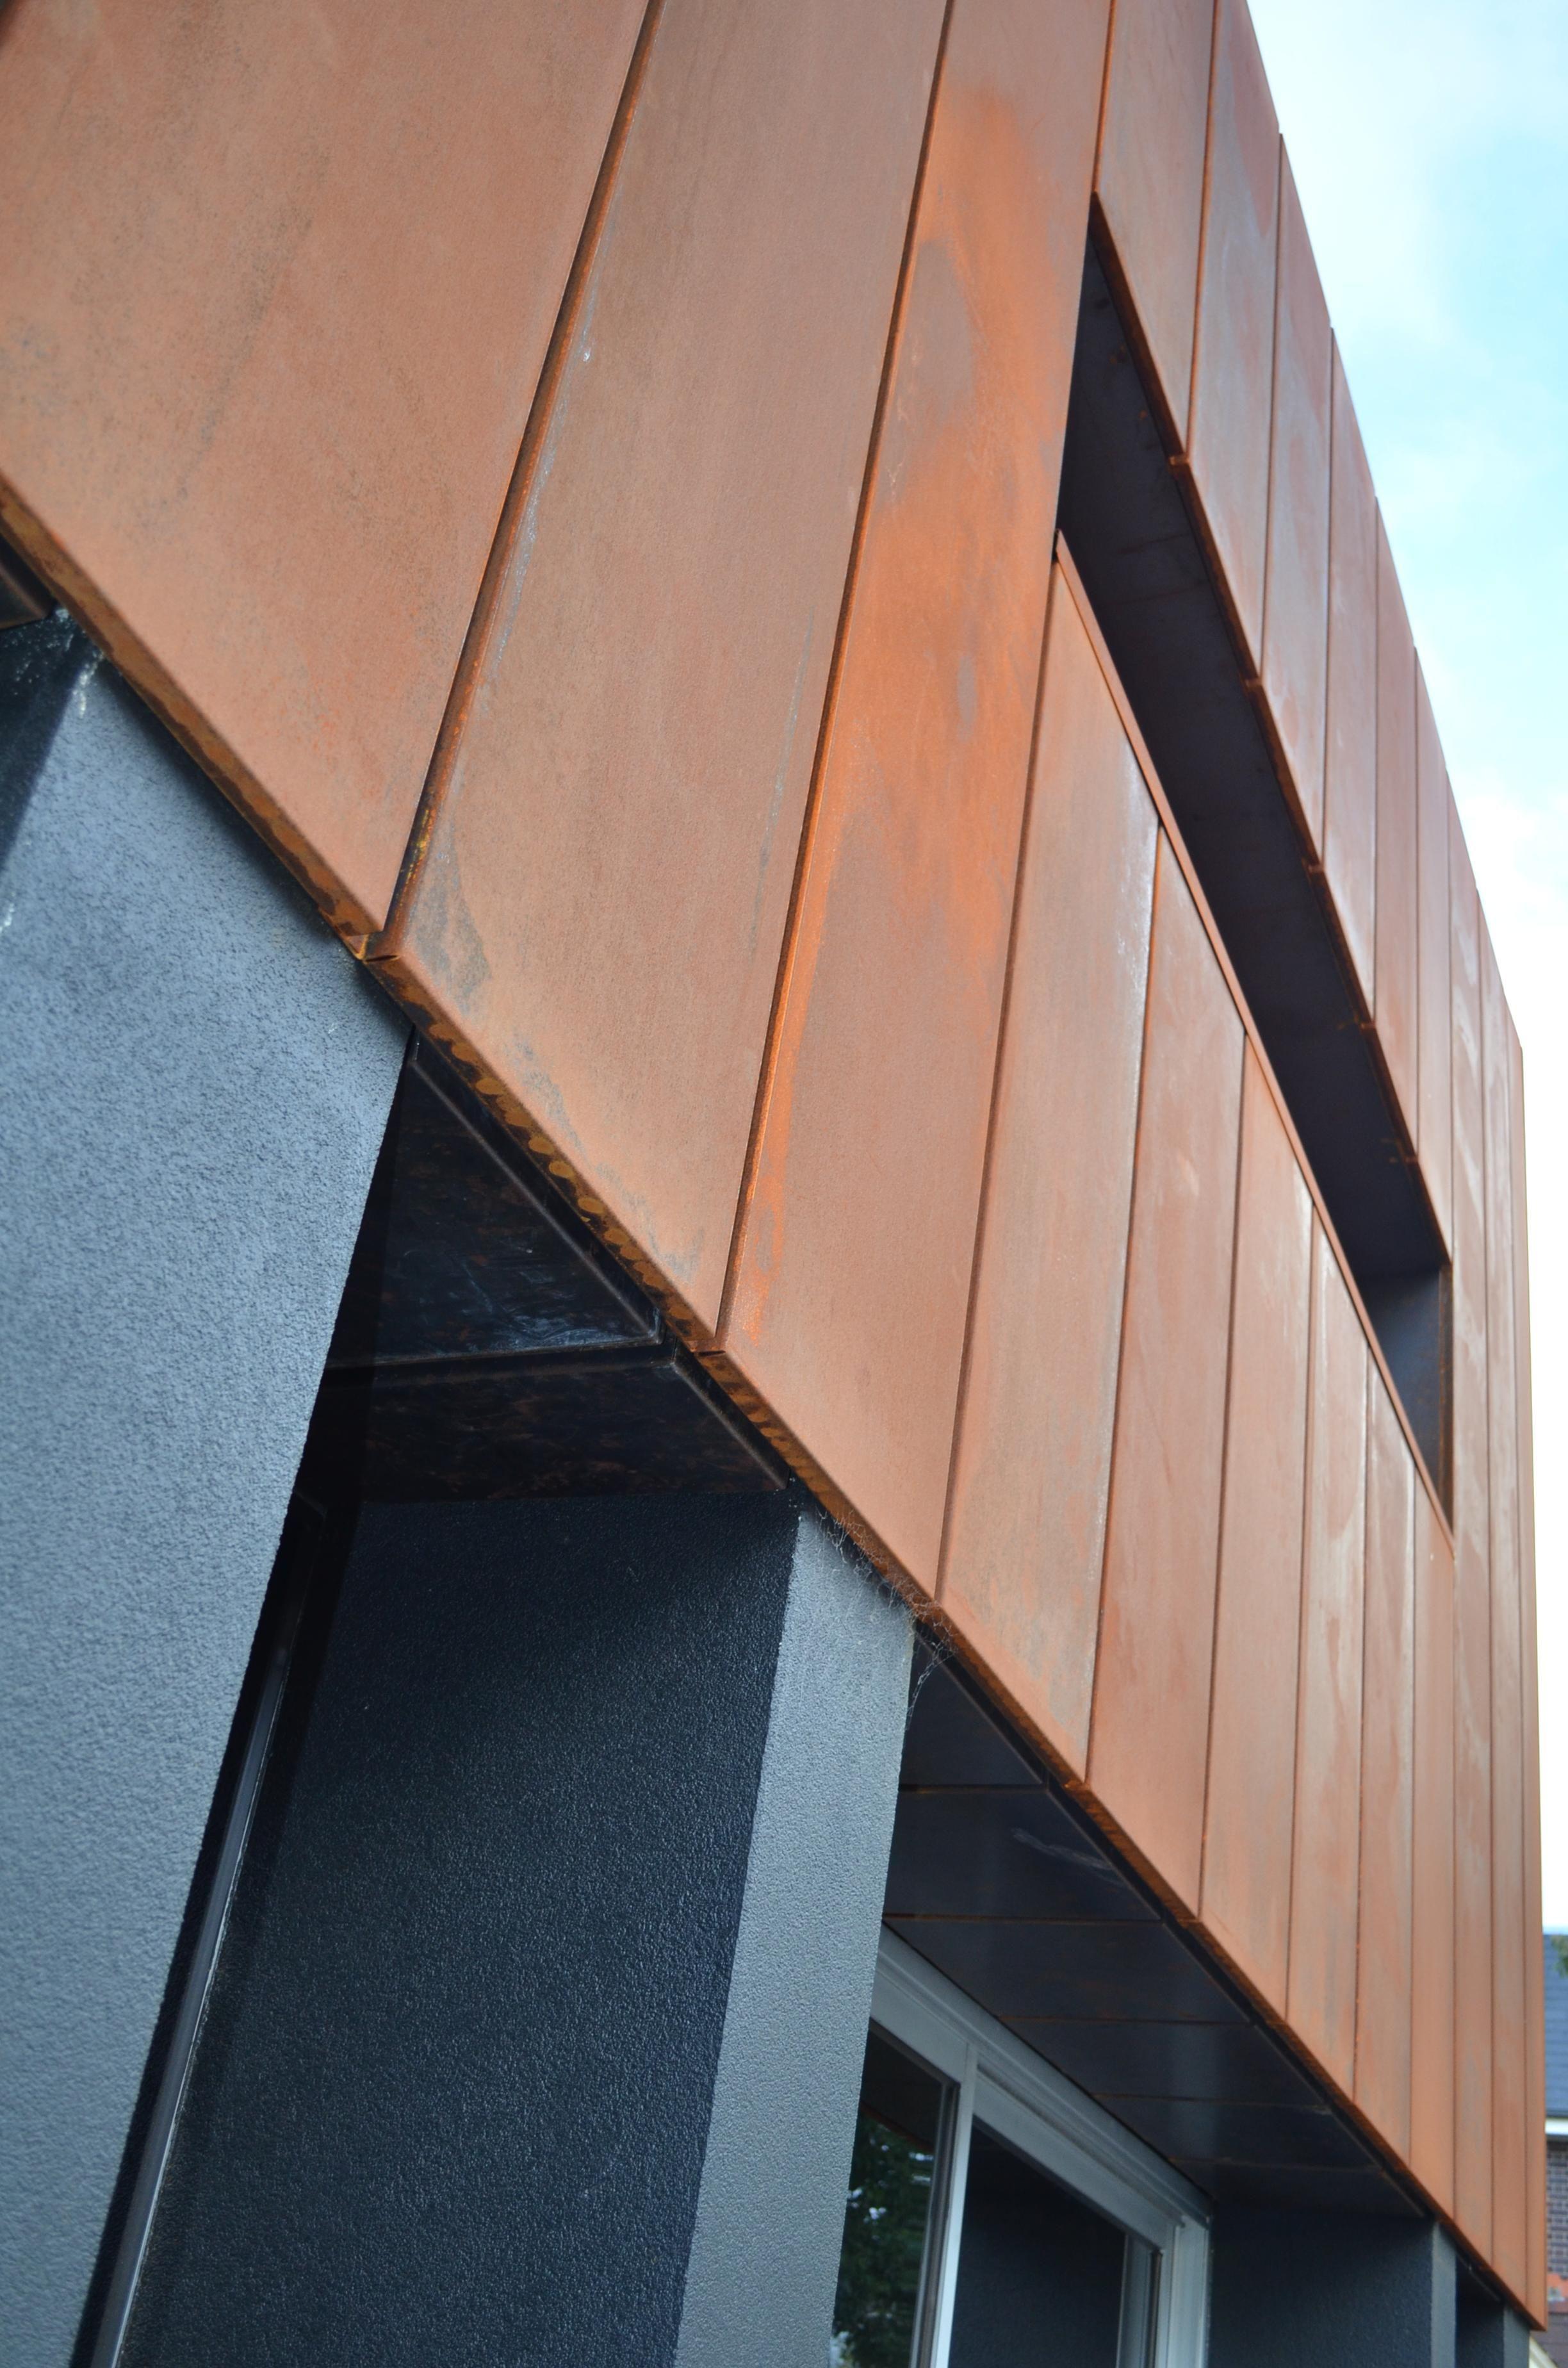 Cassette Panel Copper In 2020 Cladding Design Cladding Cladding Panels